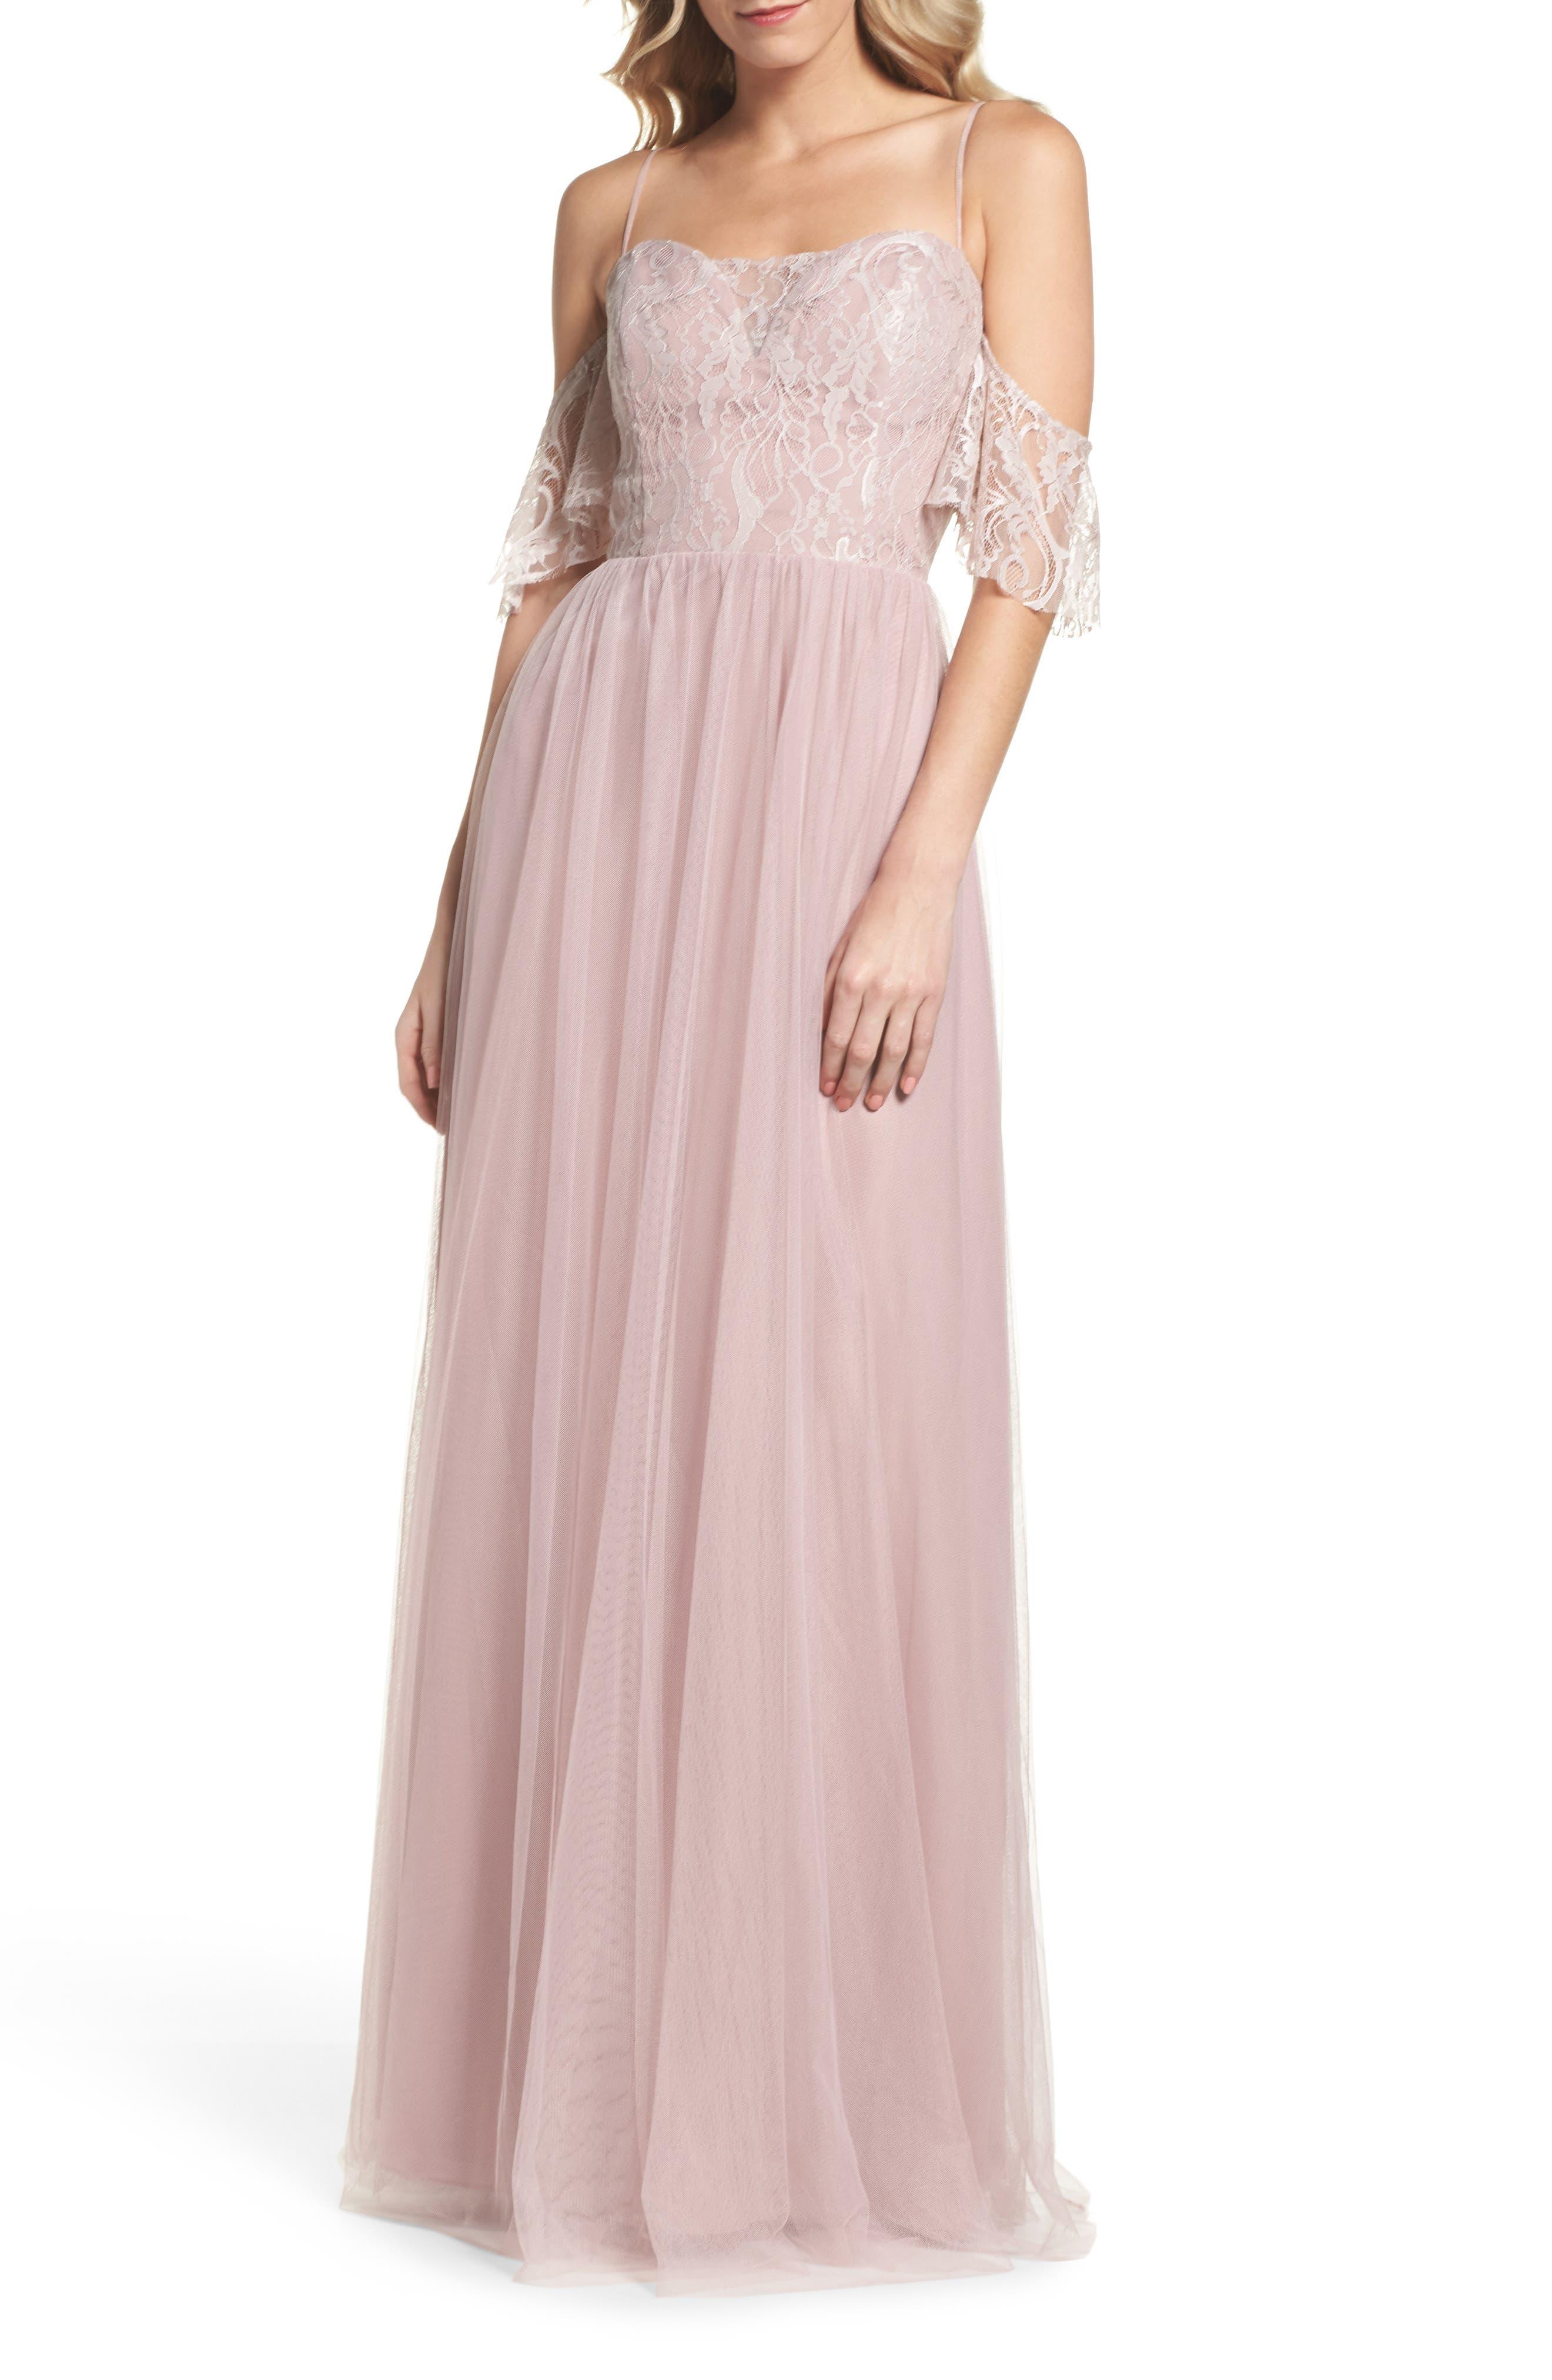 Cold Shoulder Lace Gown,                             Main thumbnail 1, color,                             Dusty Rose